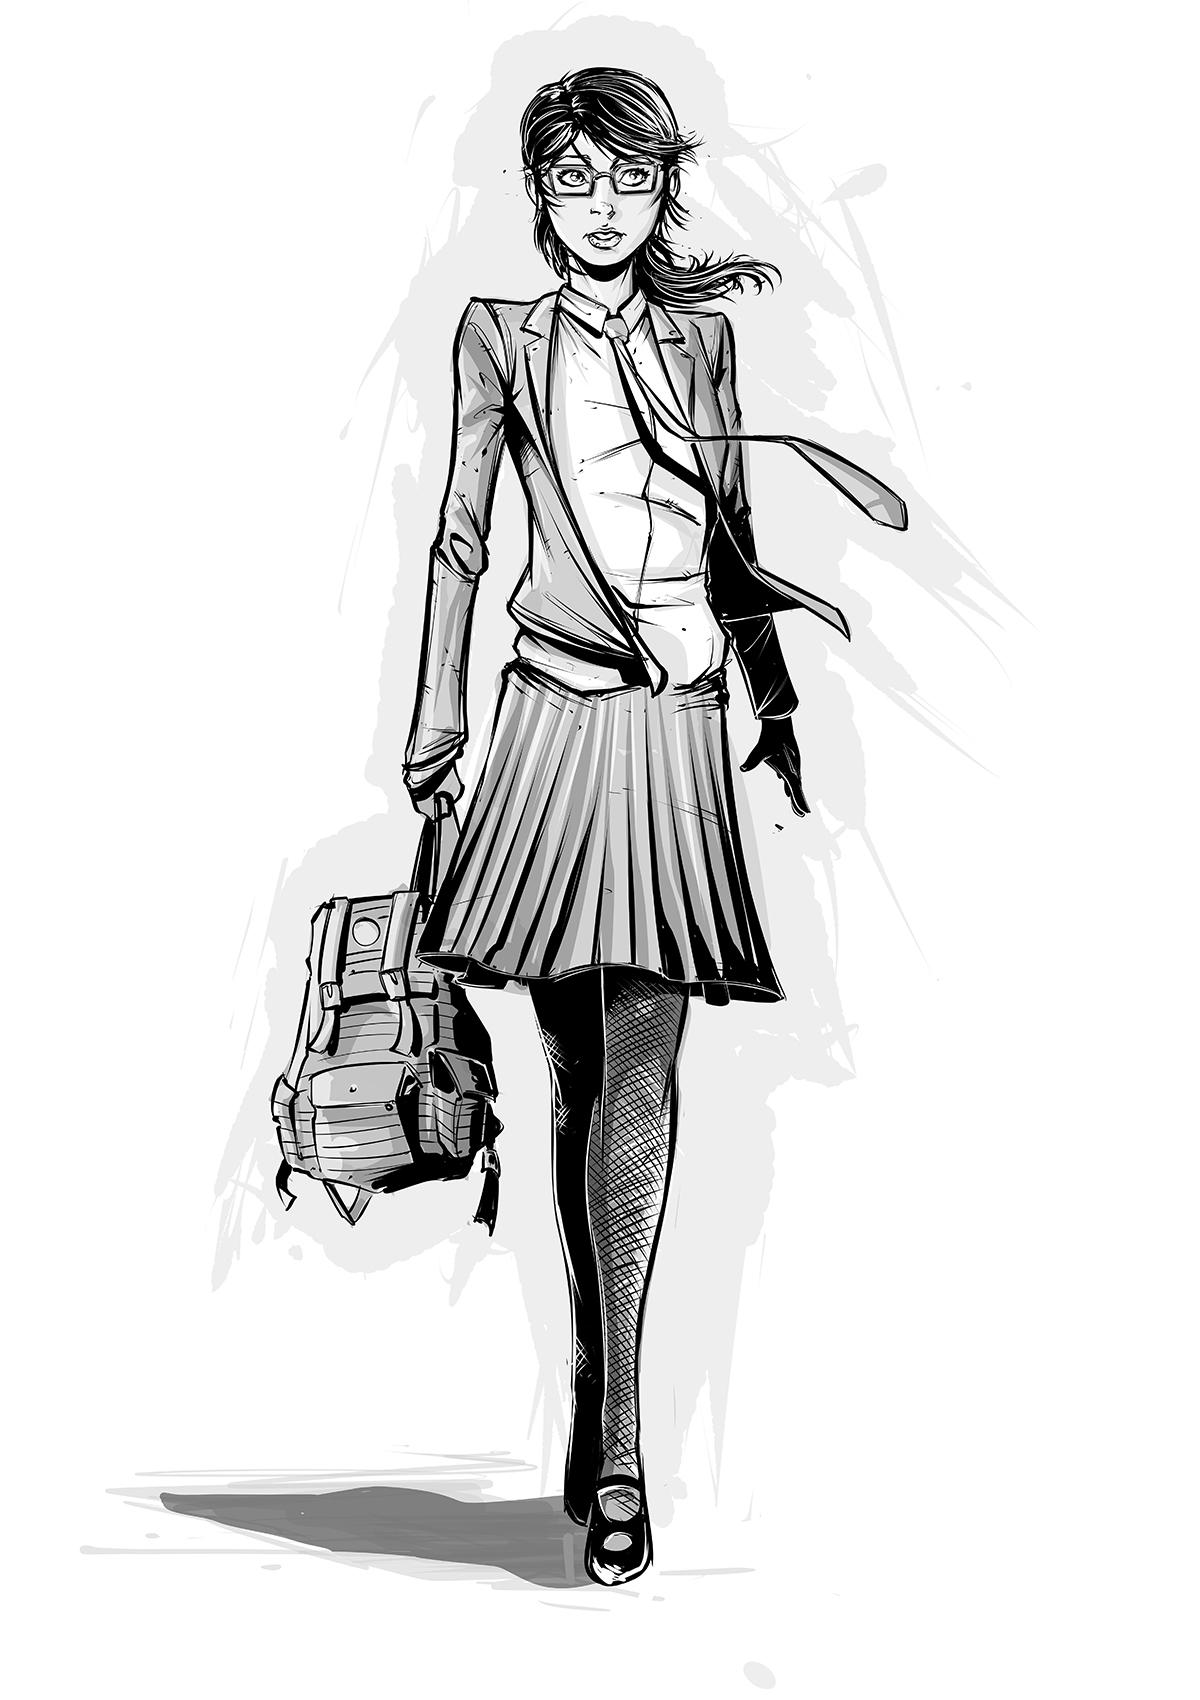 Amrit Birdi Illustrator on Joe Sugg's Username:Evie